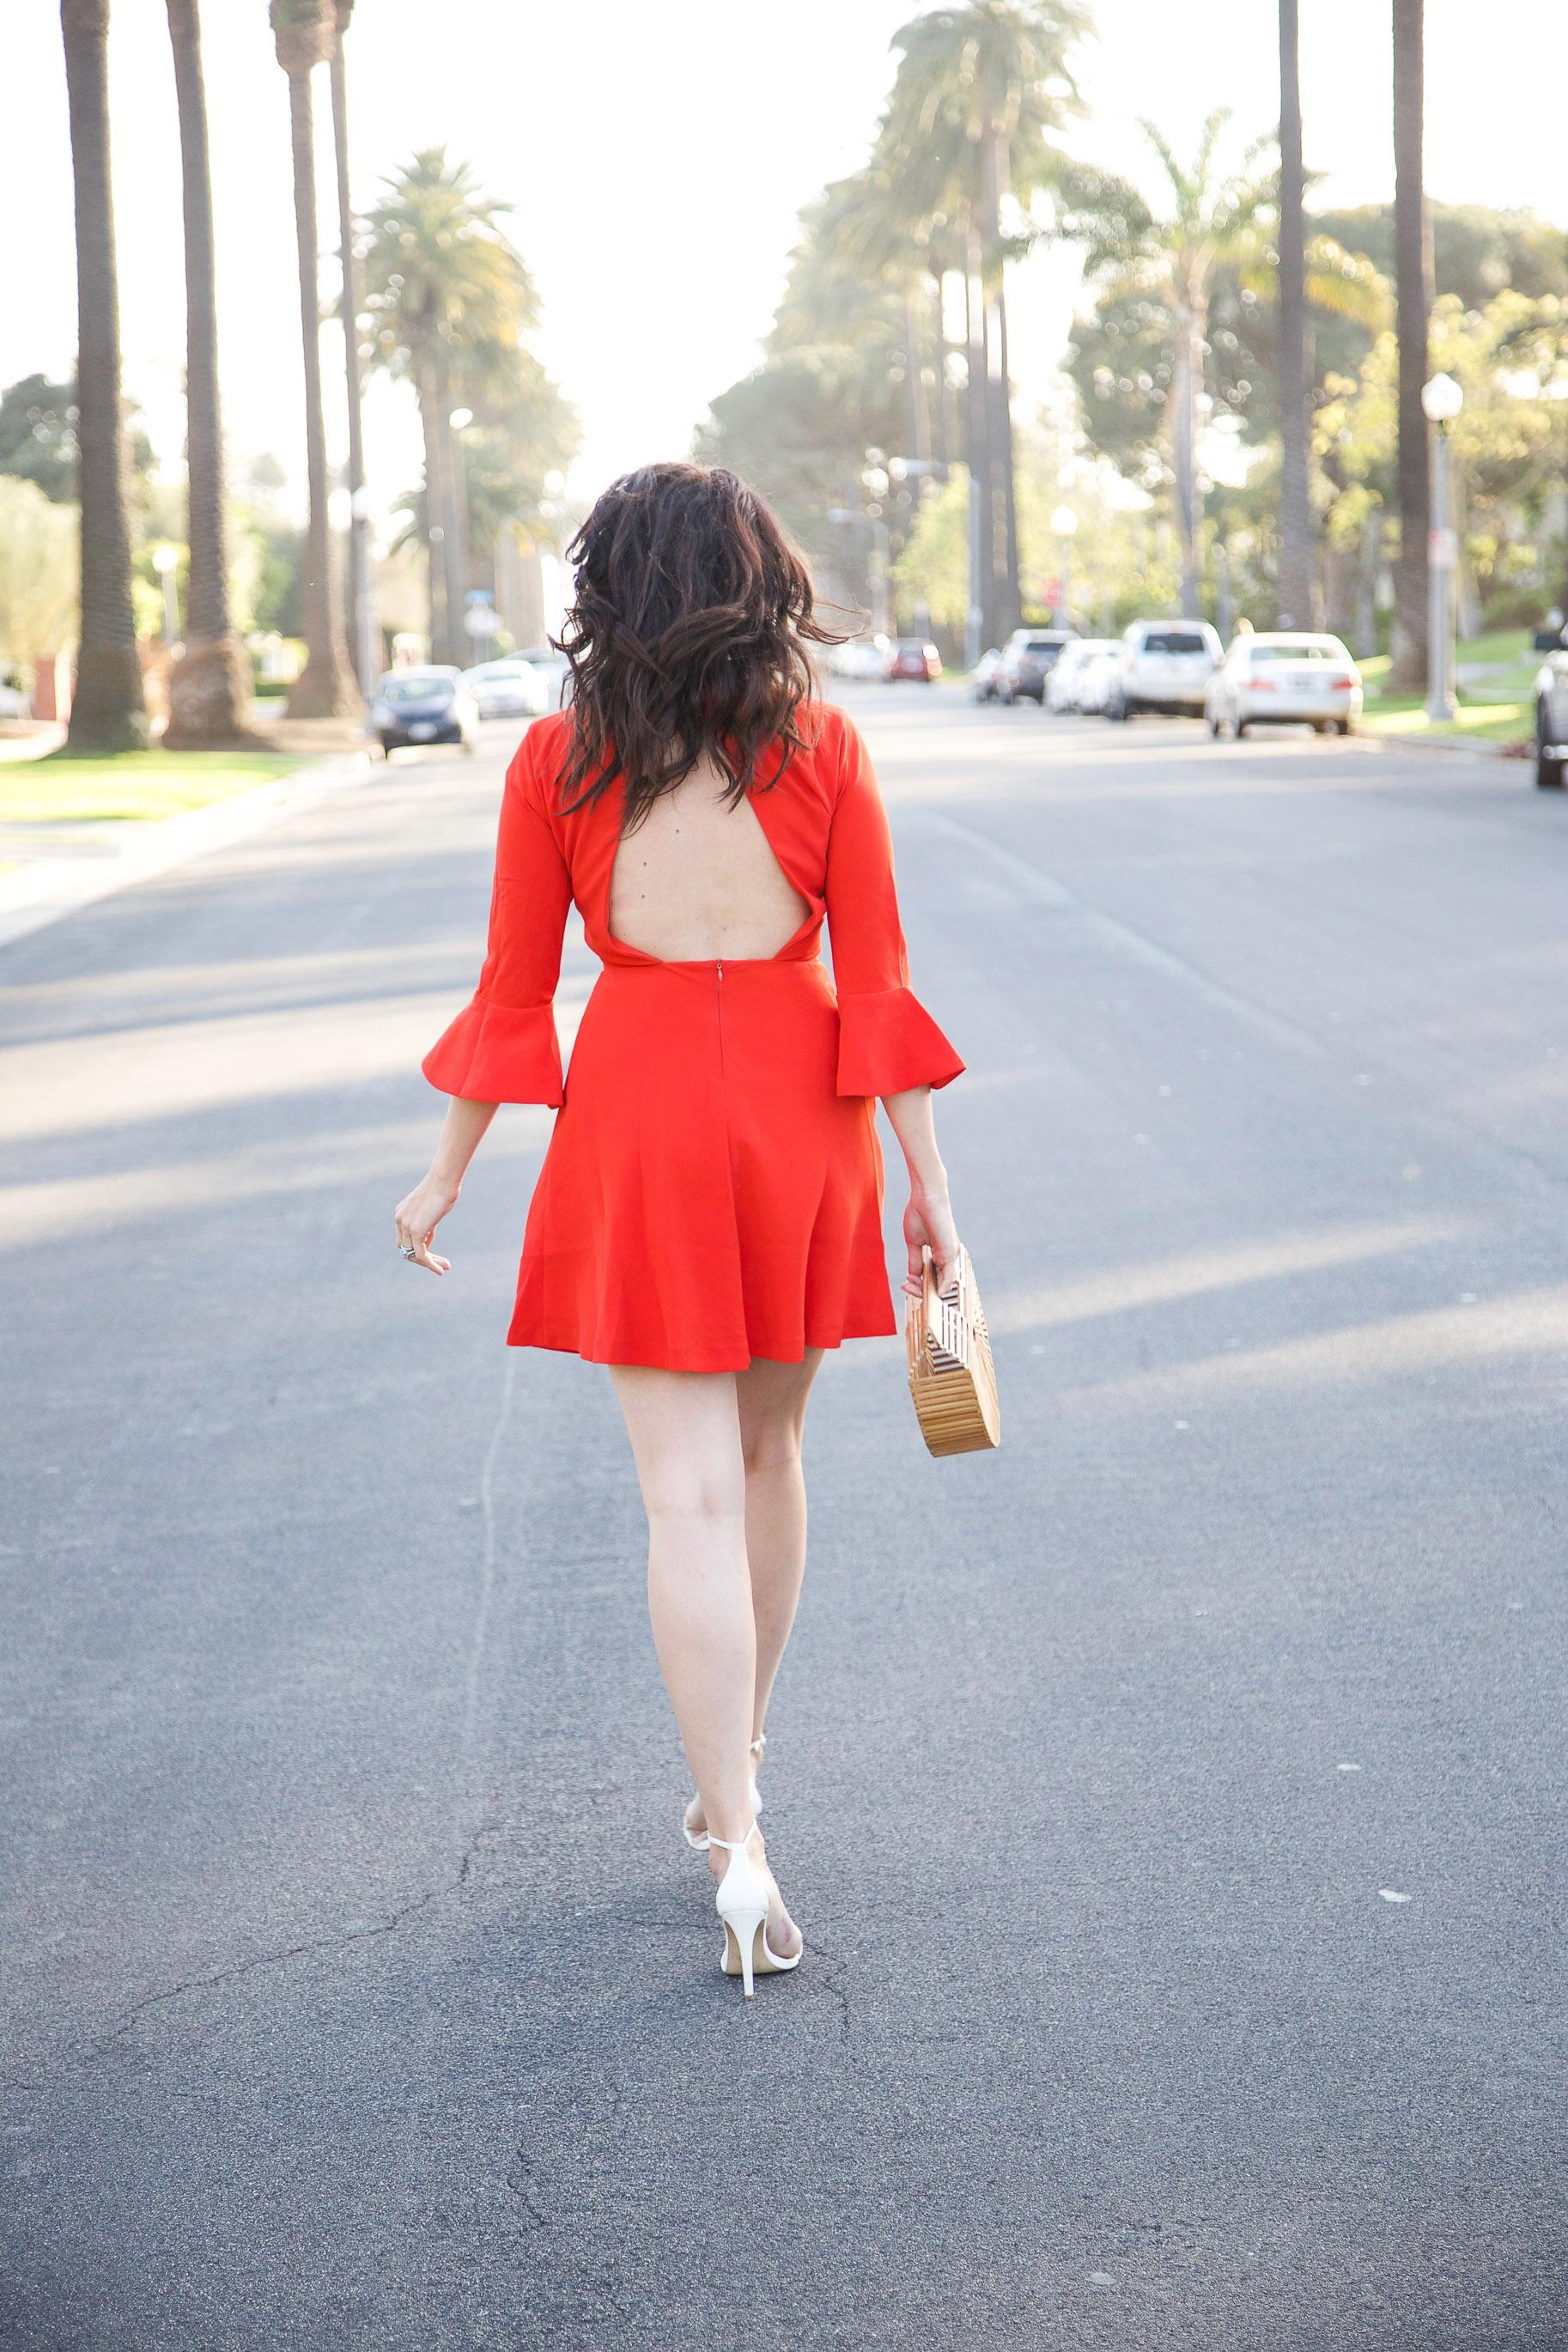 Lucy-Paris-Red-Bell-Sleeved-Dress3.jpg